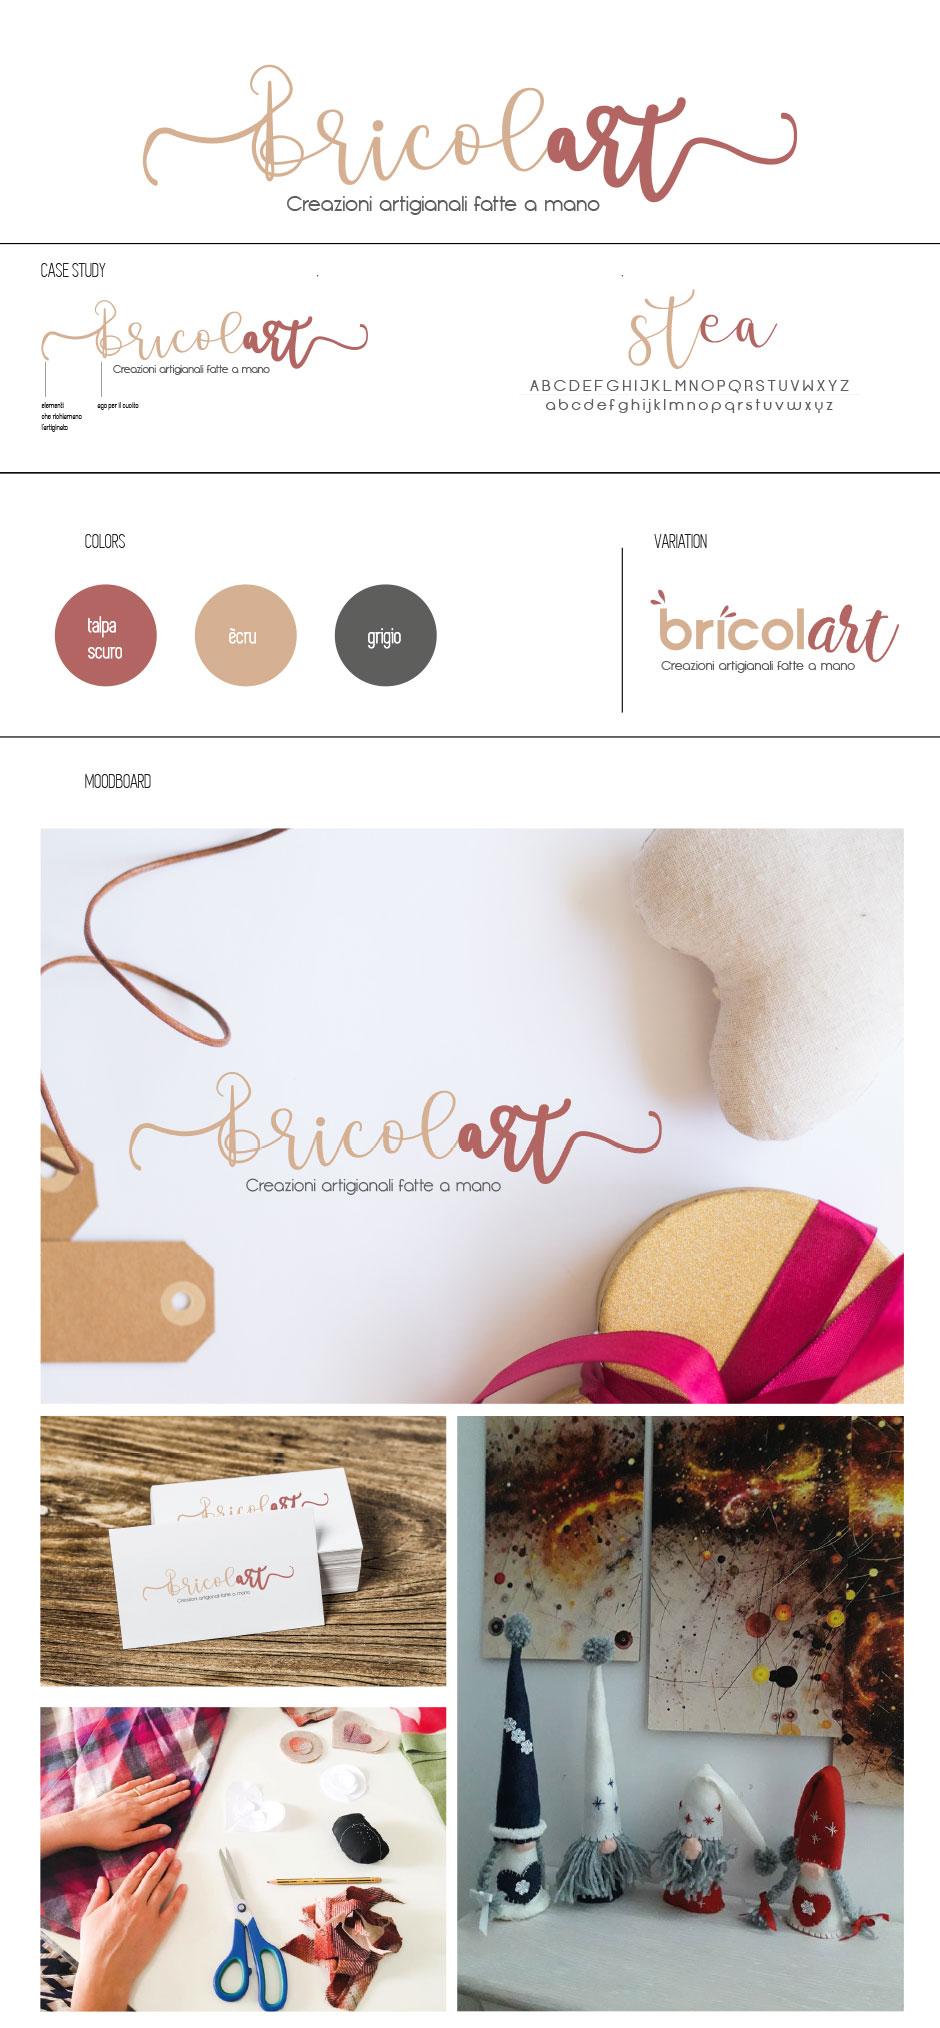 bricolart logo branding artigianato handmade salerno